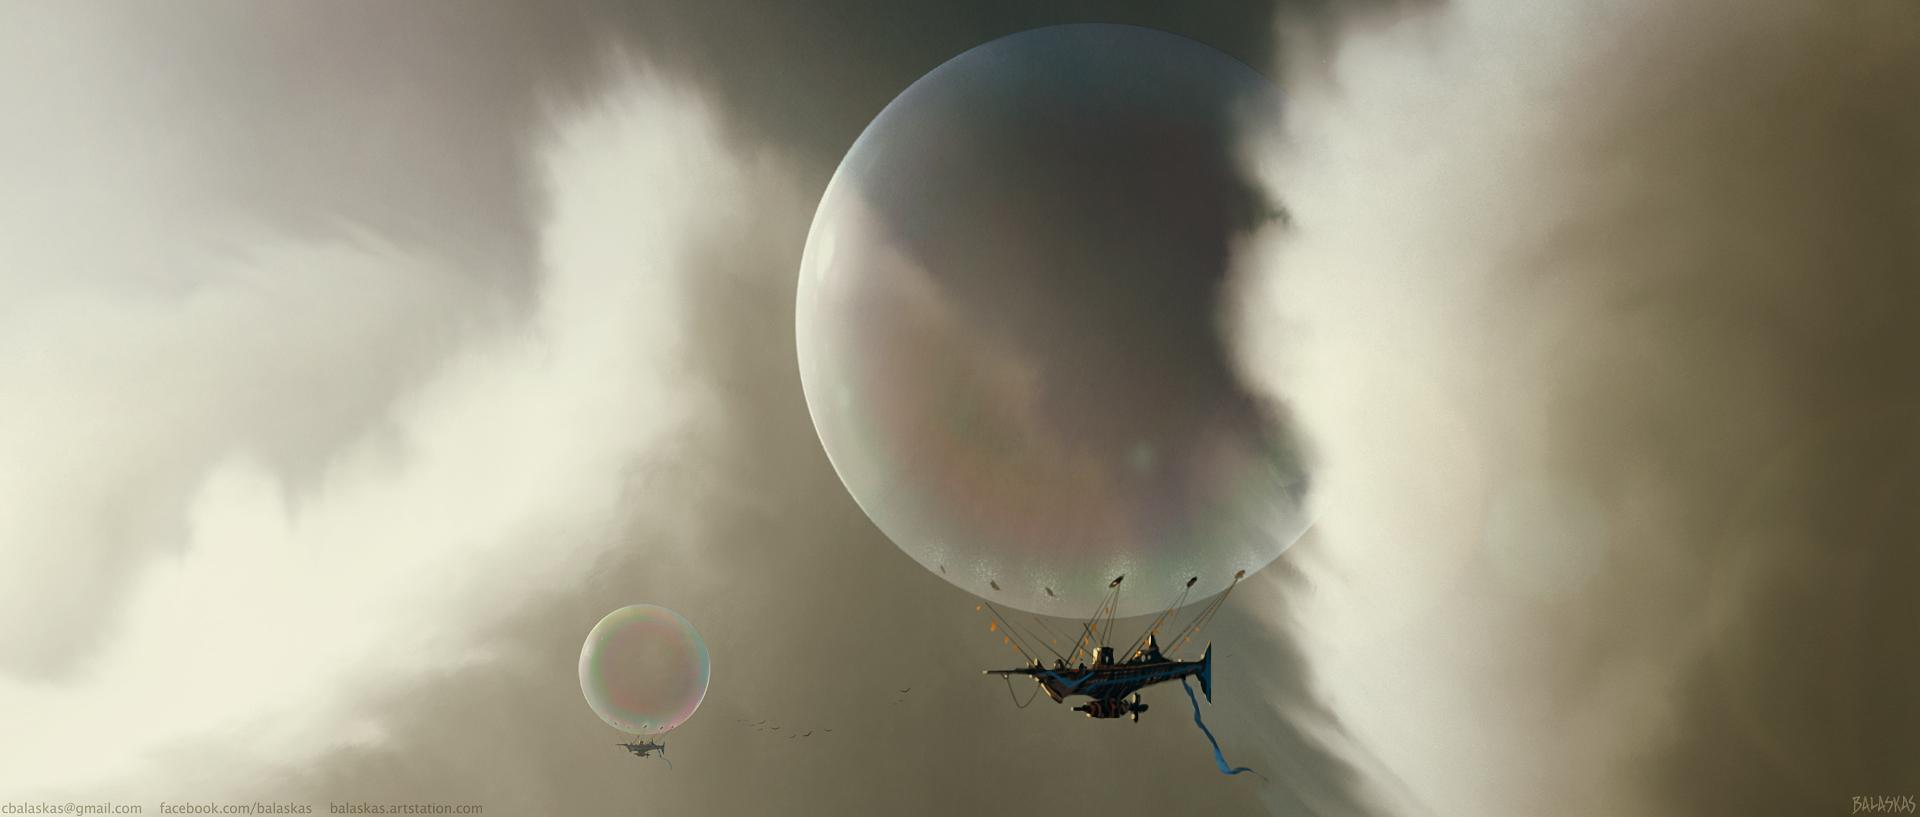 1299-the-bubble-navy-christopher-balaskas